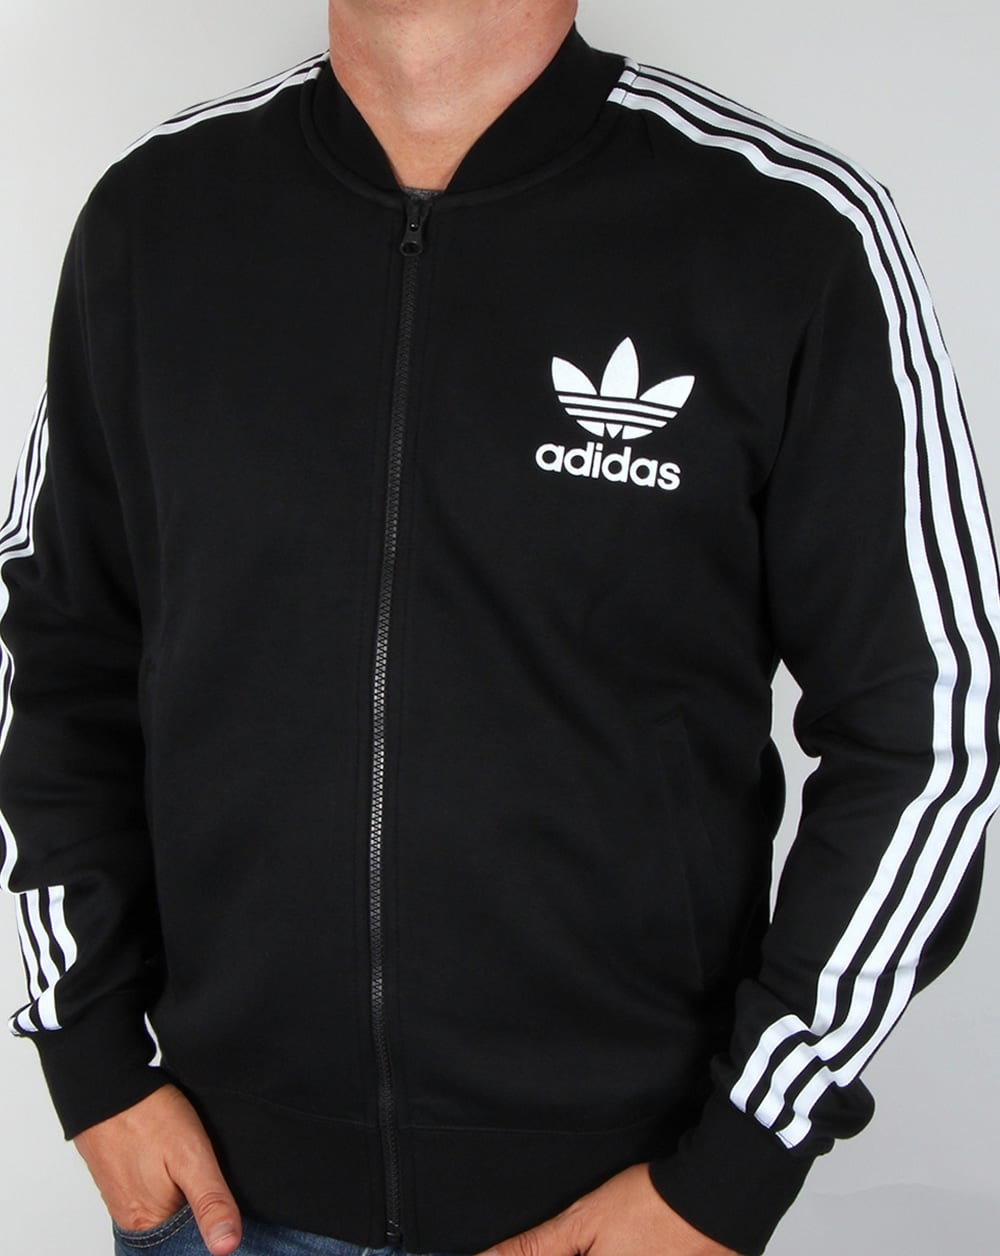 Adidas Superstar Large Logo Track Top Black